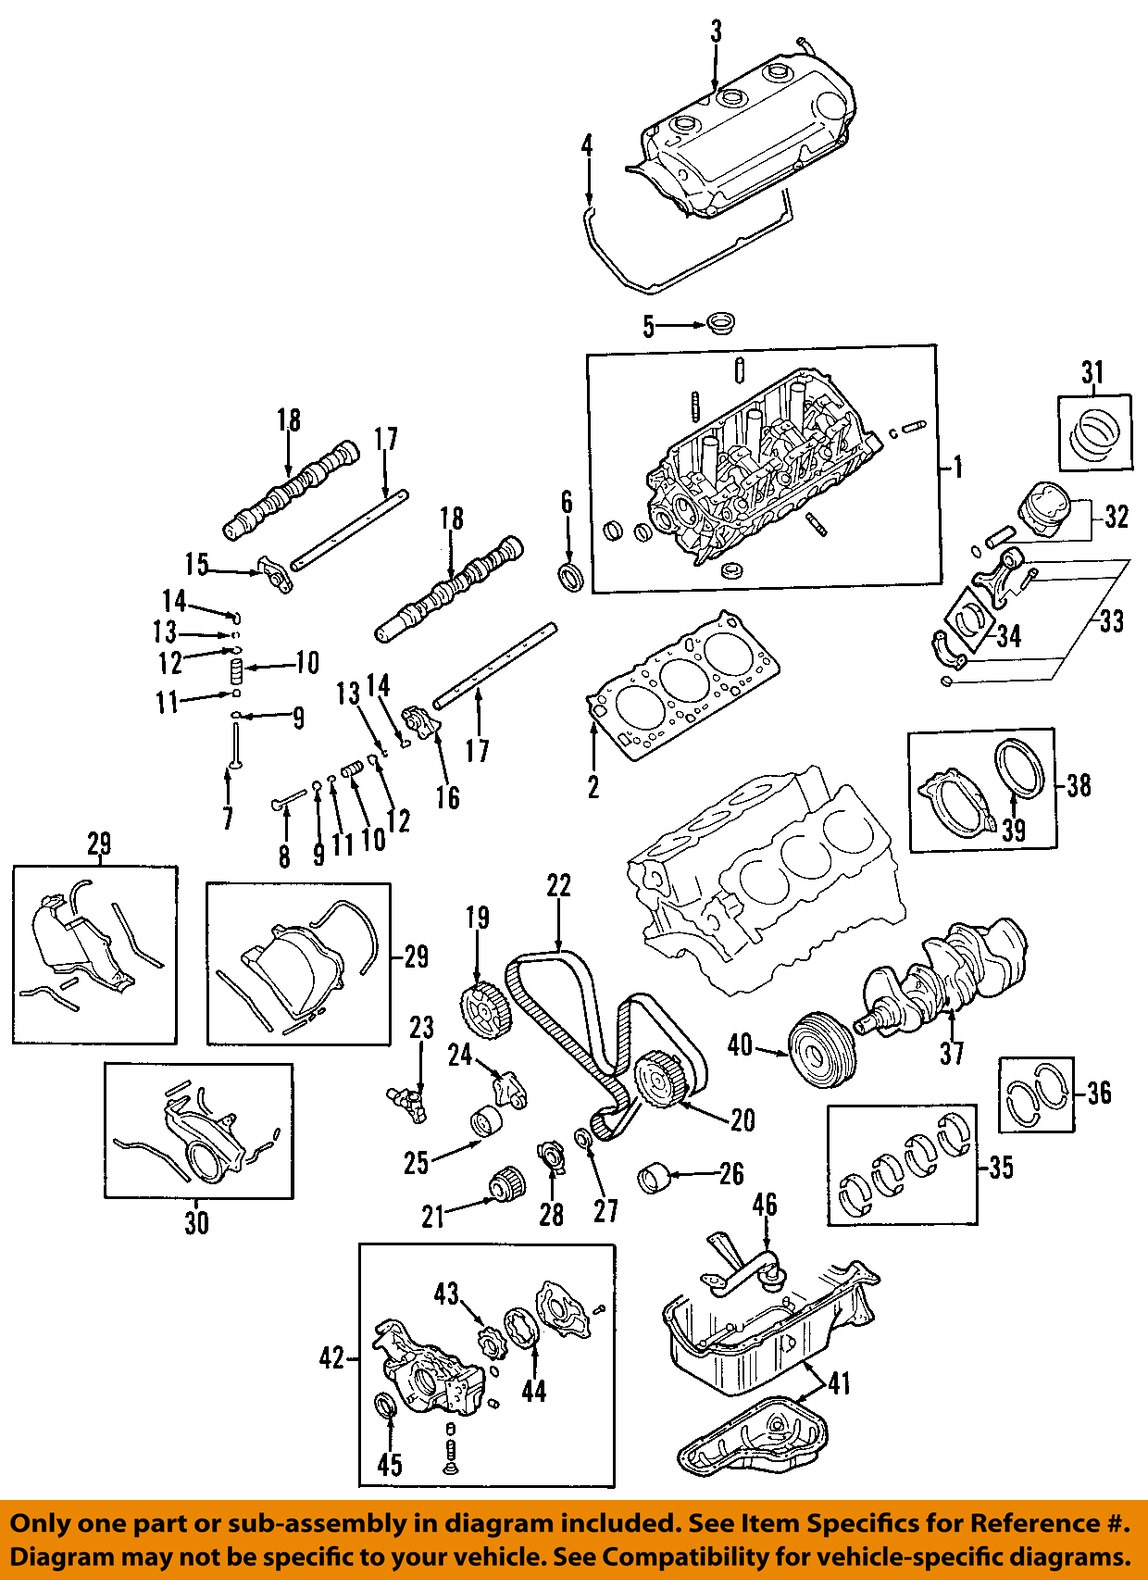 2002 mitsubishi eclipse engine diagram wiring for ibanez blazer guitar pajero schematic best library montero limited heater rh 9 gamersadda org 2000 mazda mpv